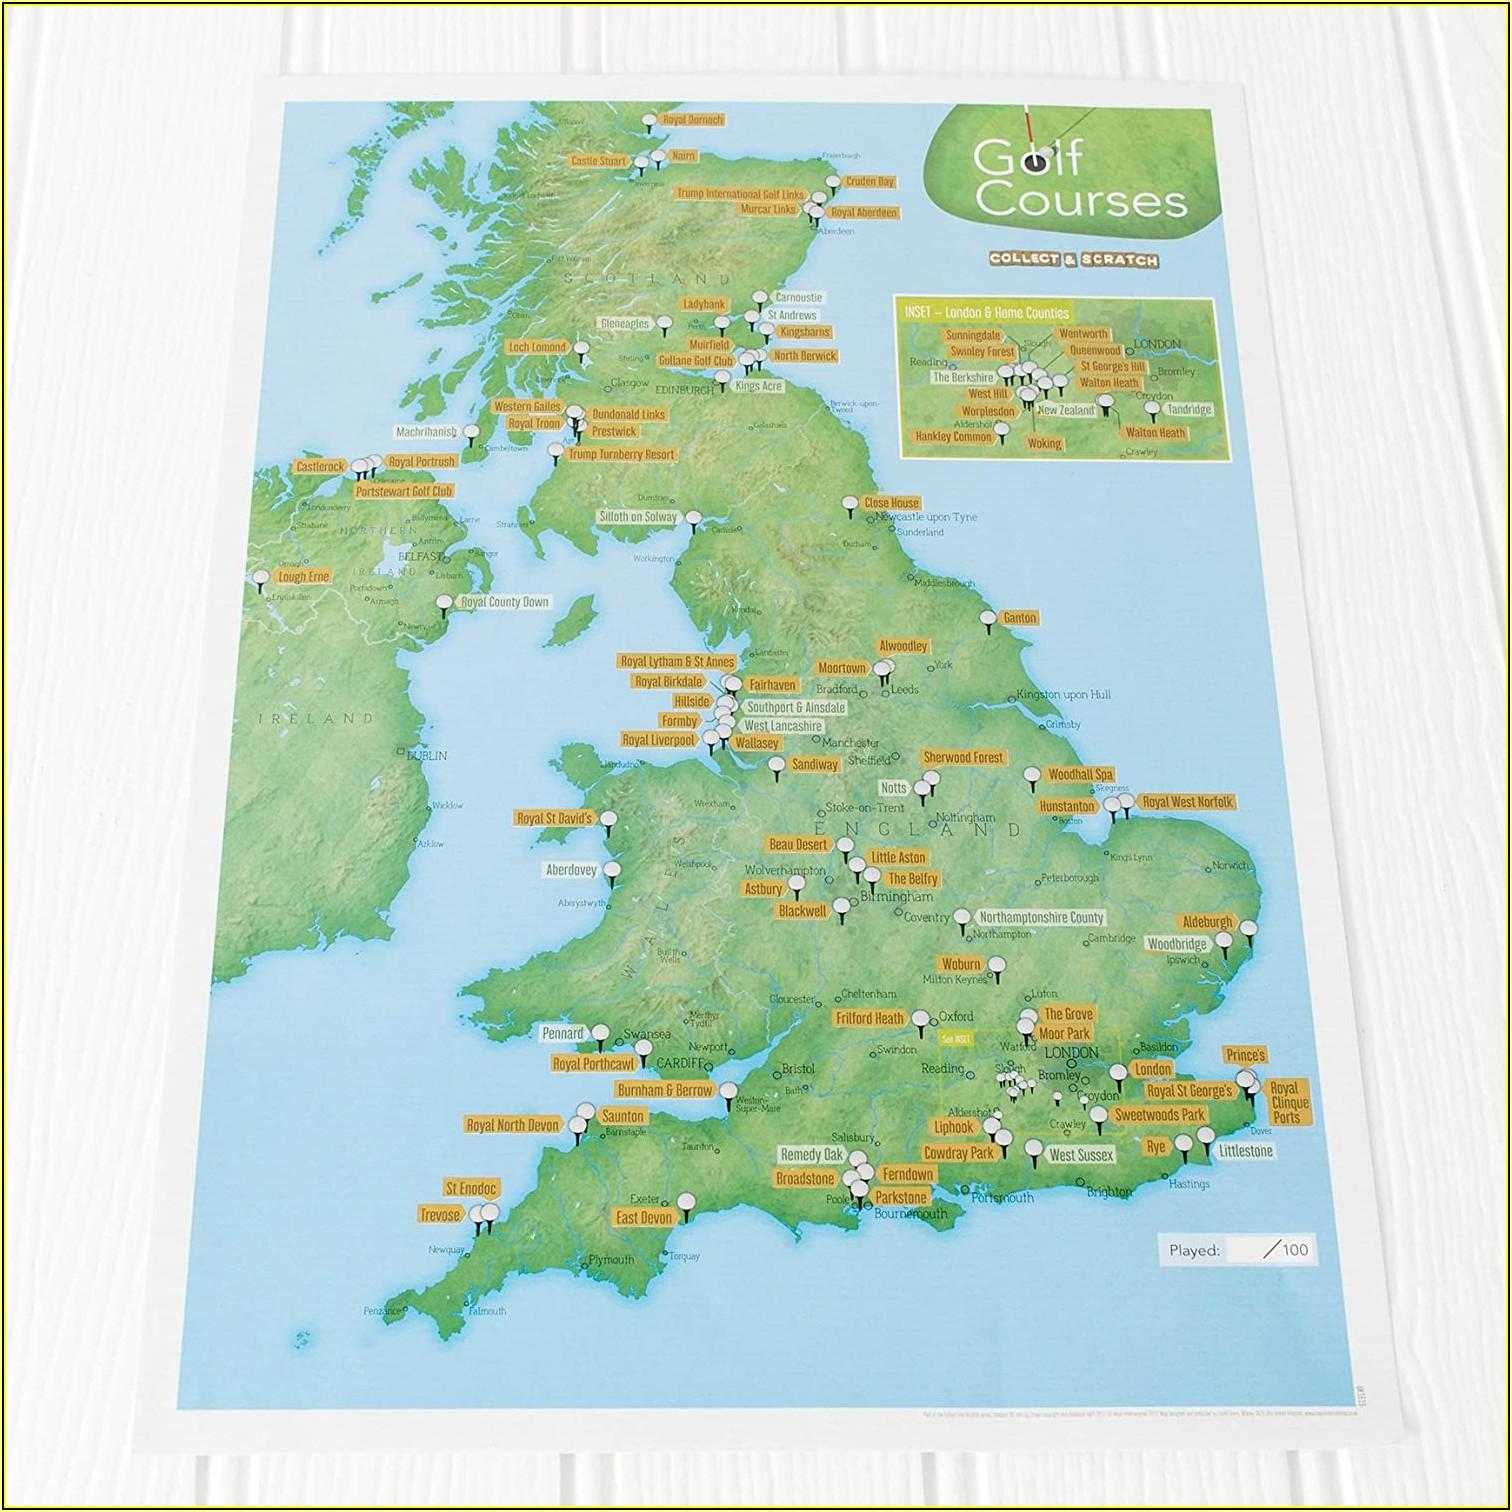 Ireland Best Golf Courses Map